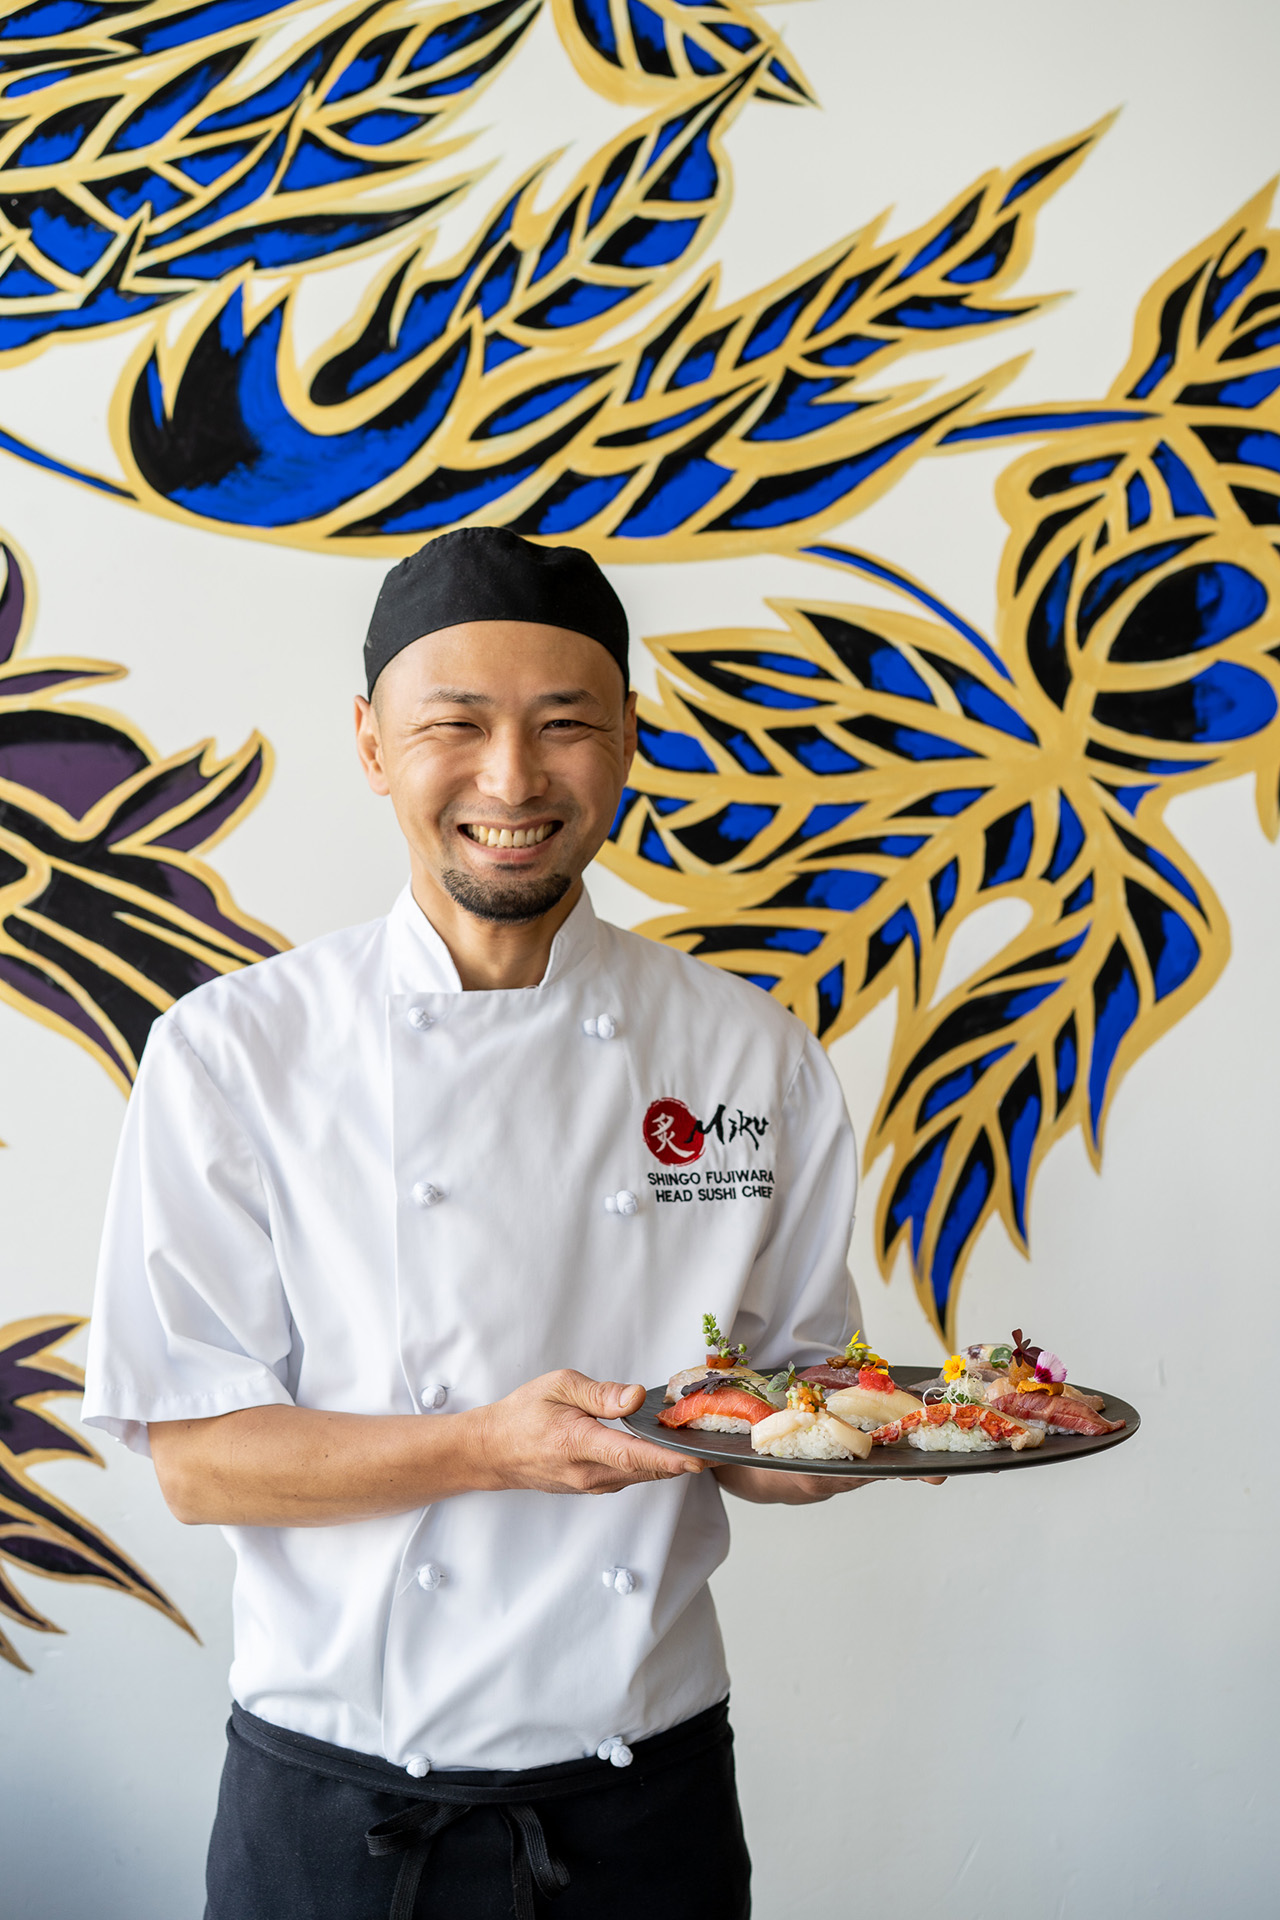 Head Sushi Chef Shingo Fujiwara proudly showcases his creations.